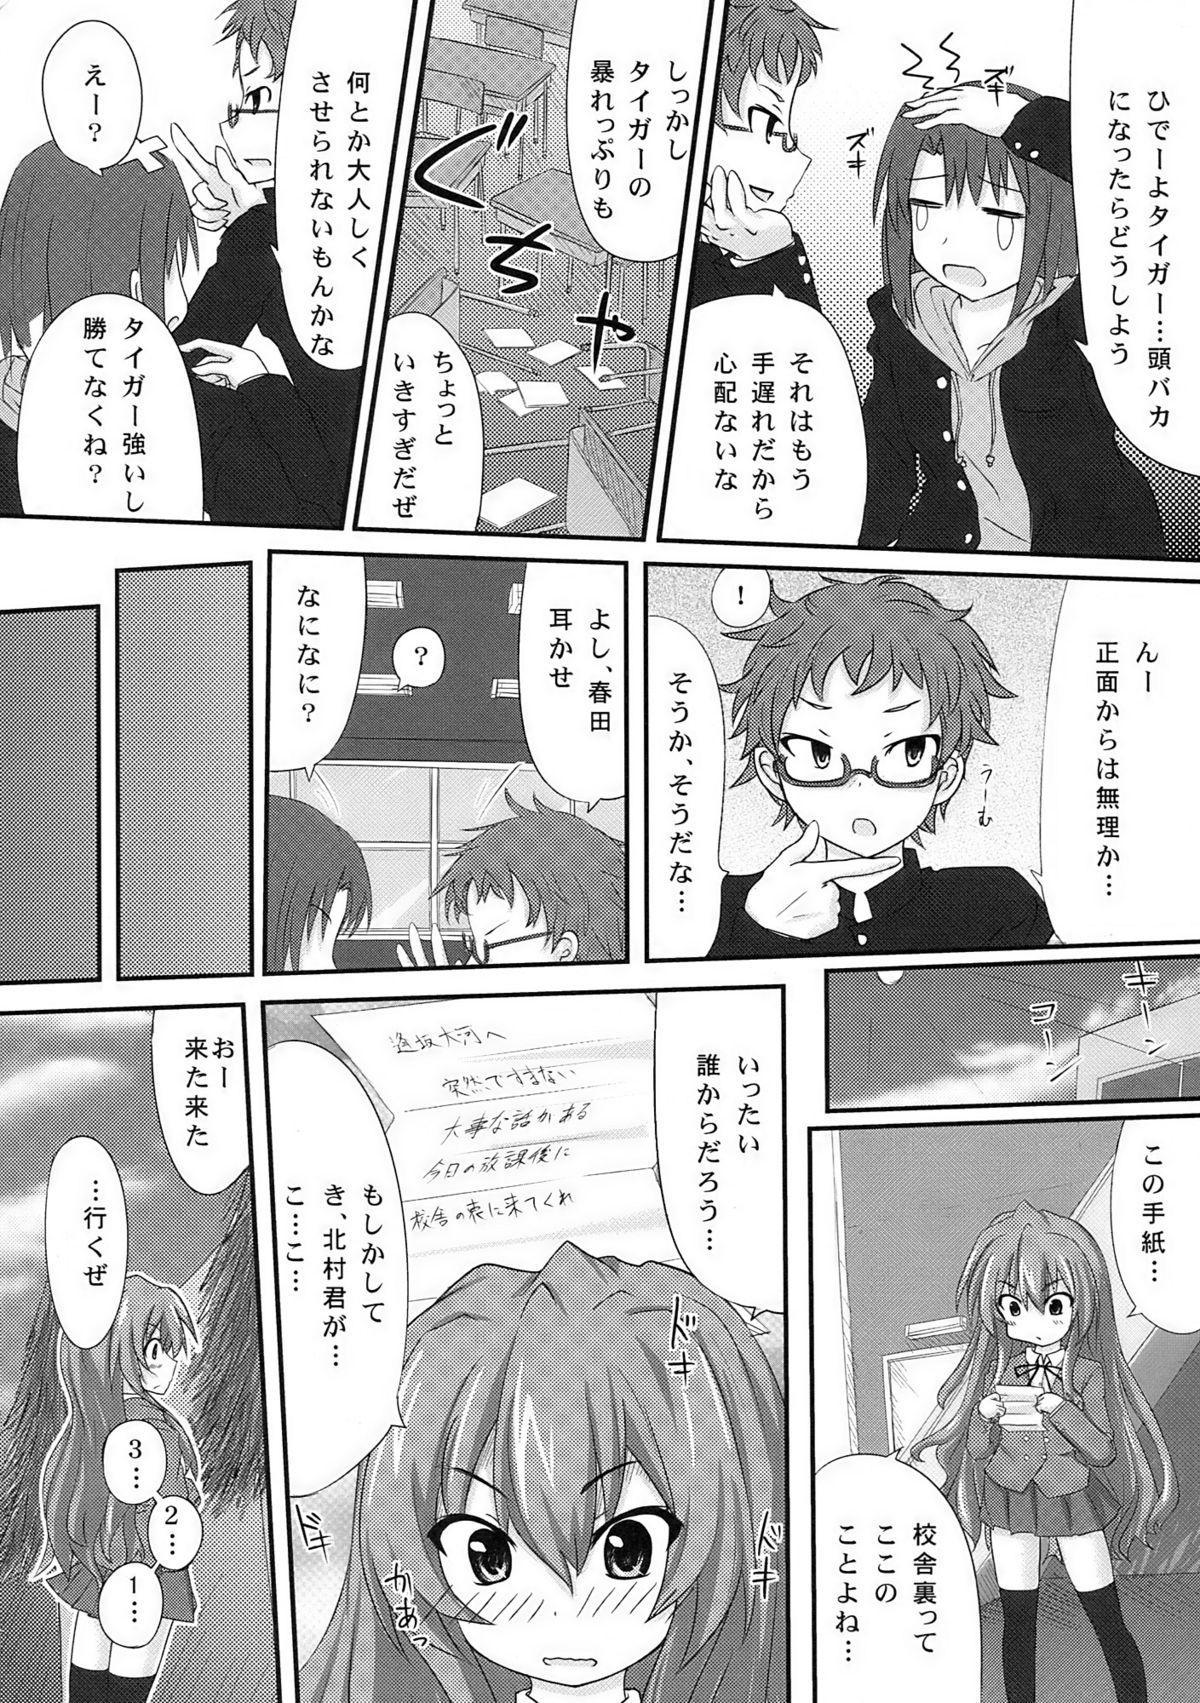 Shibarare Taiga! 5